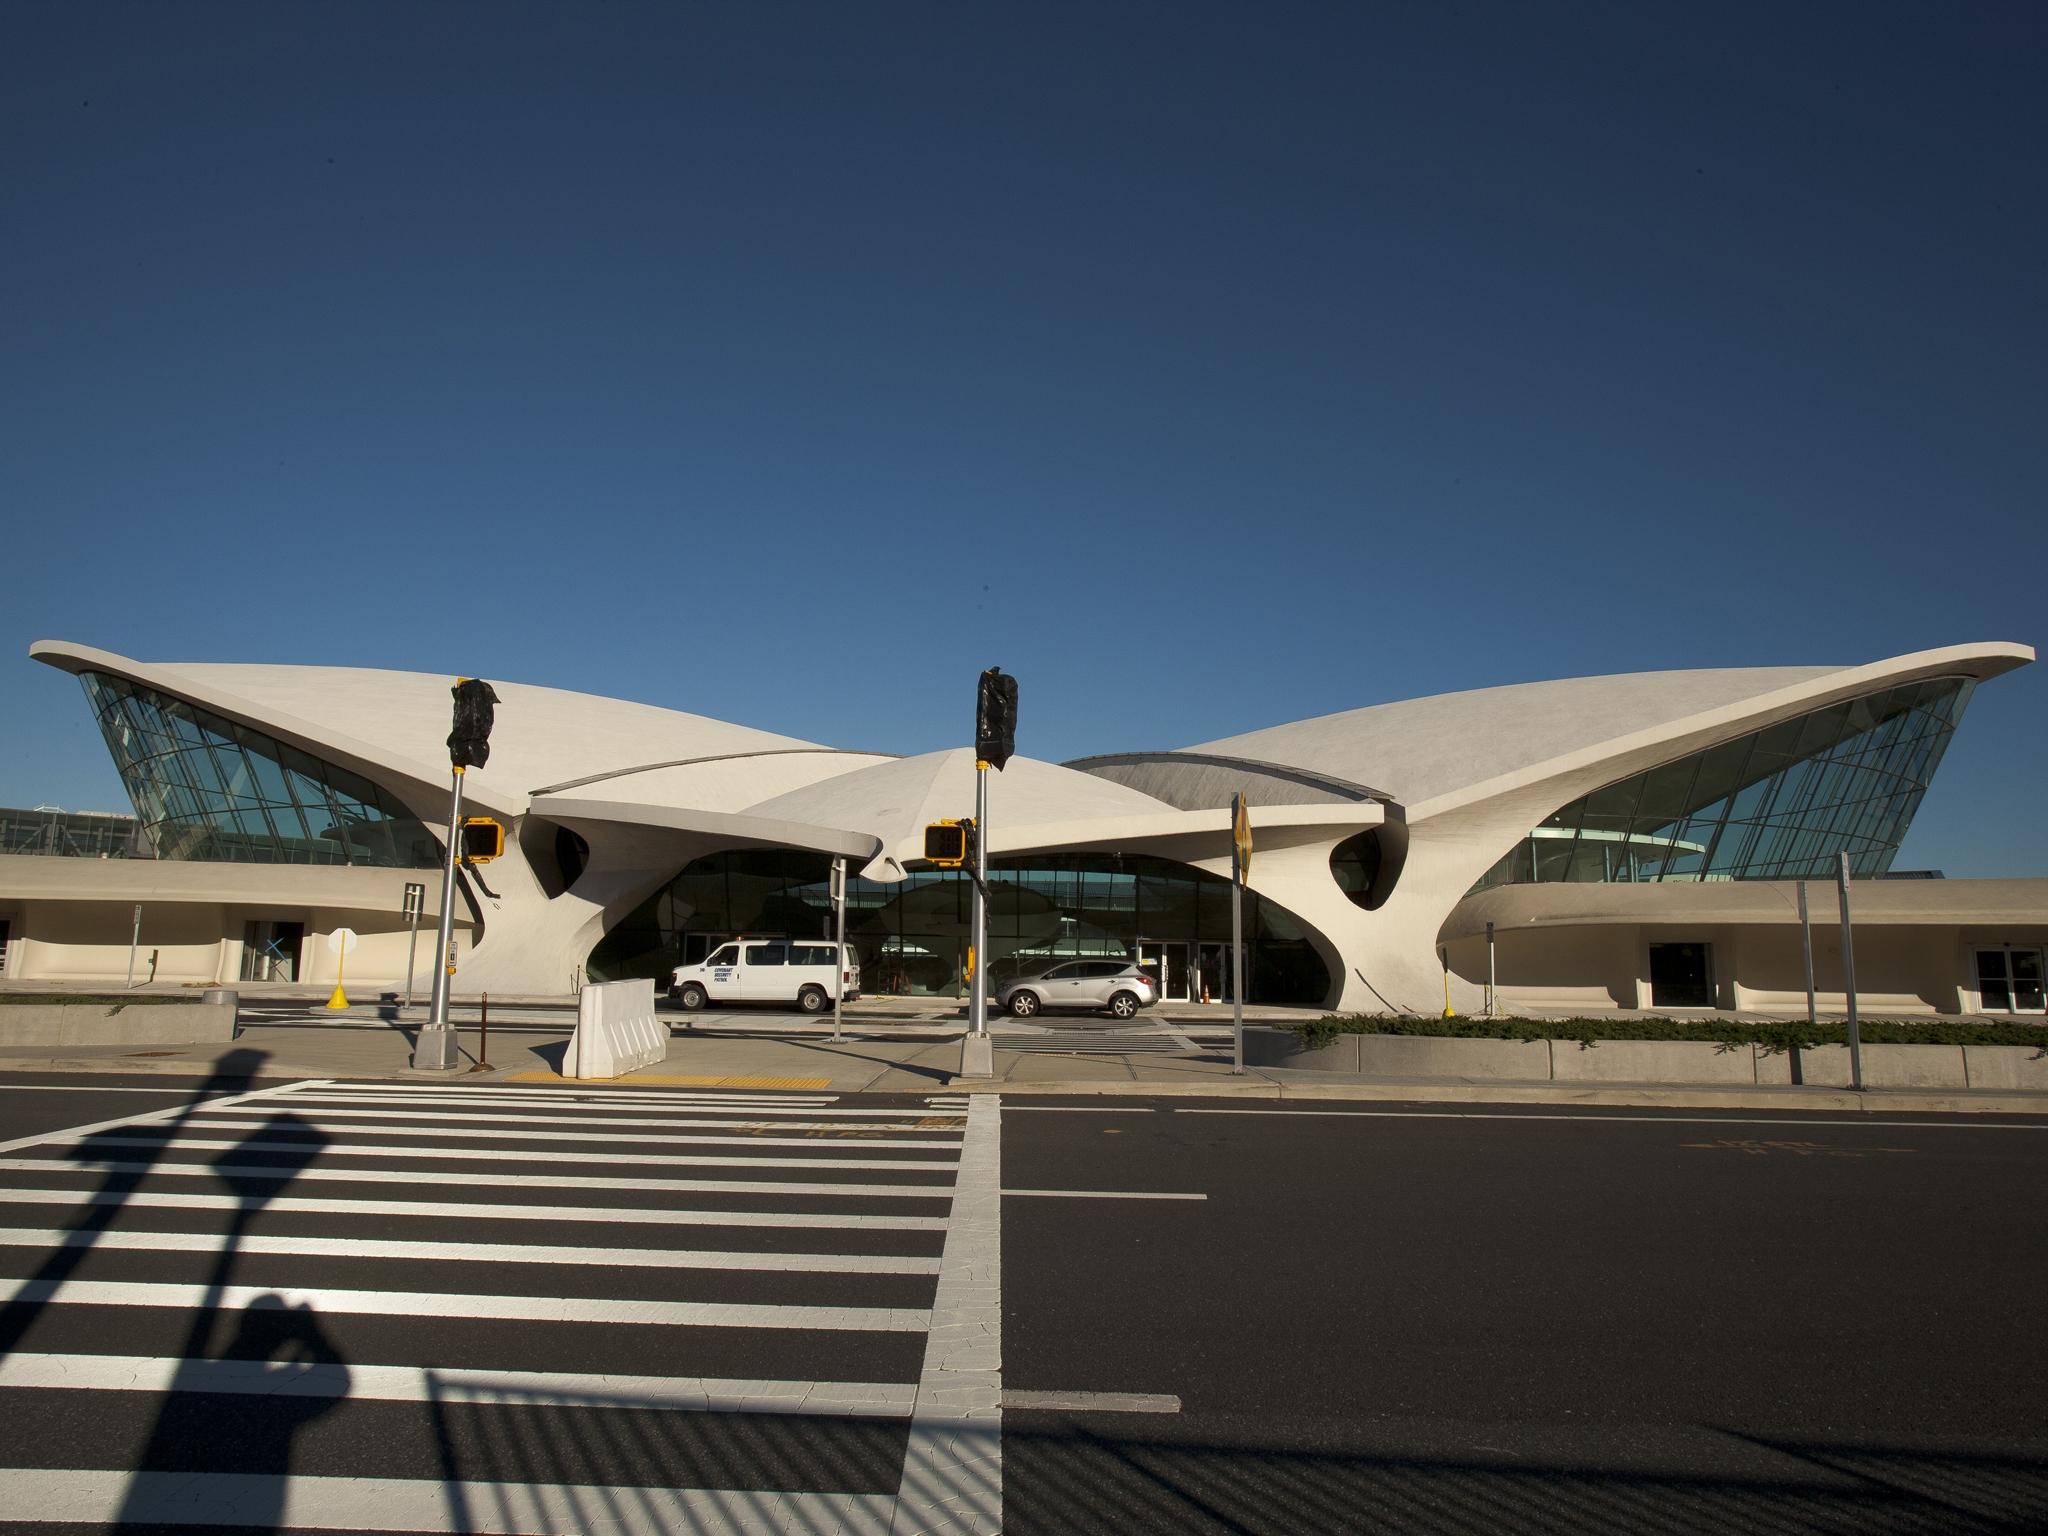 TWA TERMINAL JFK AIRPORT / NYC